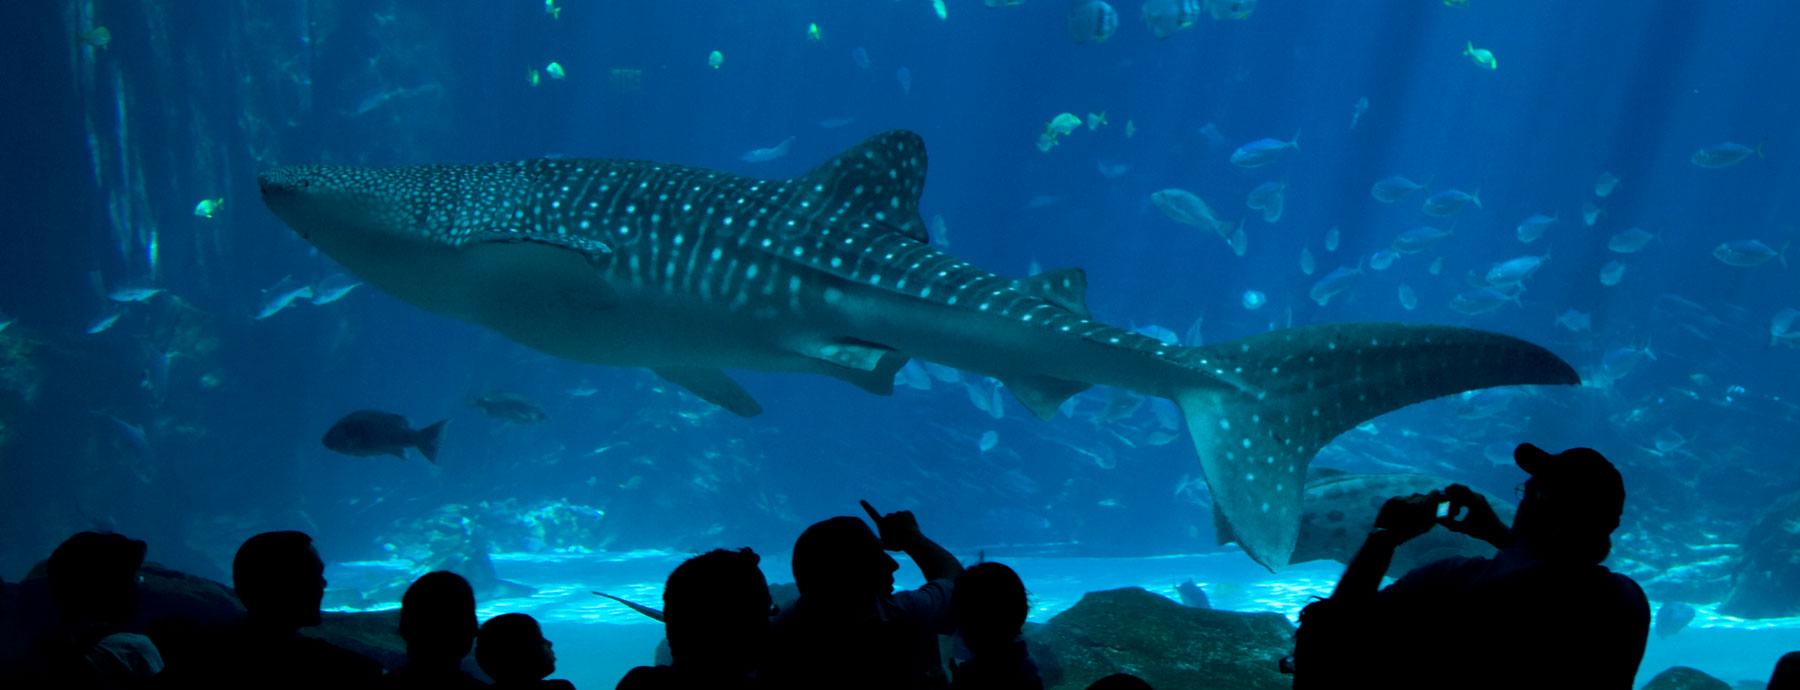 shedd-aquarium-package-at-chicago-hotel-top - مدونة خالد ...